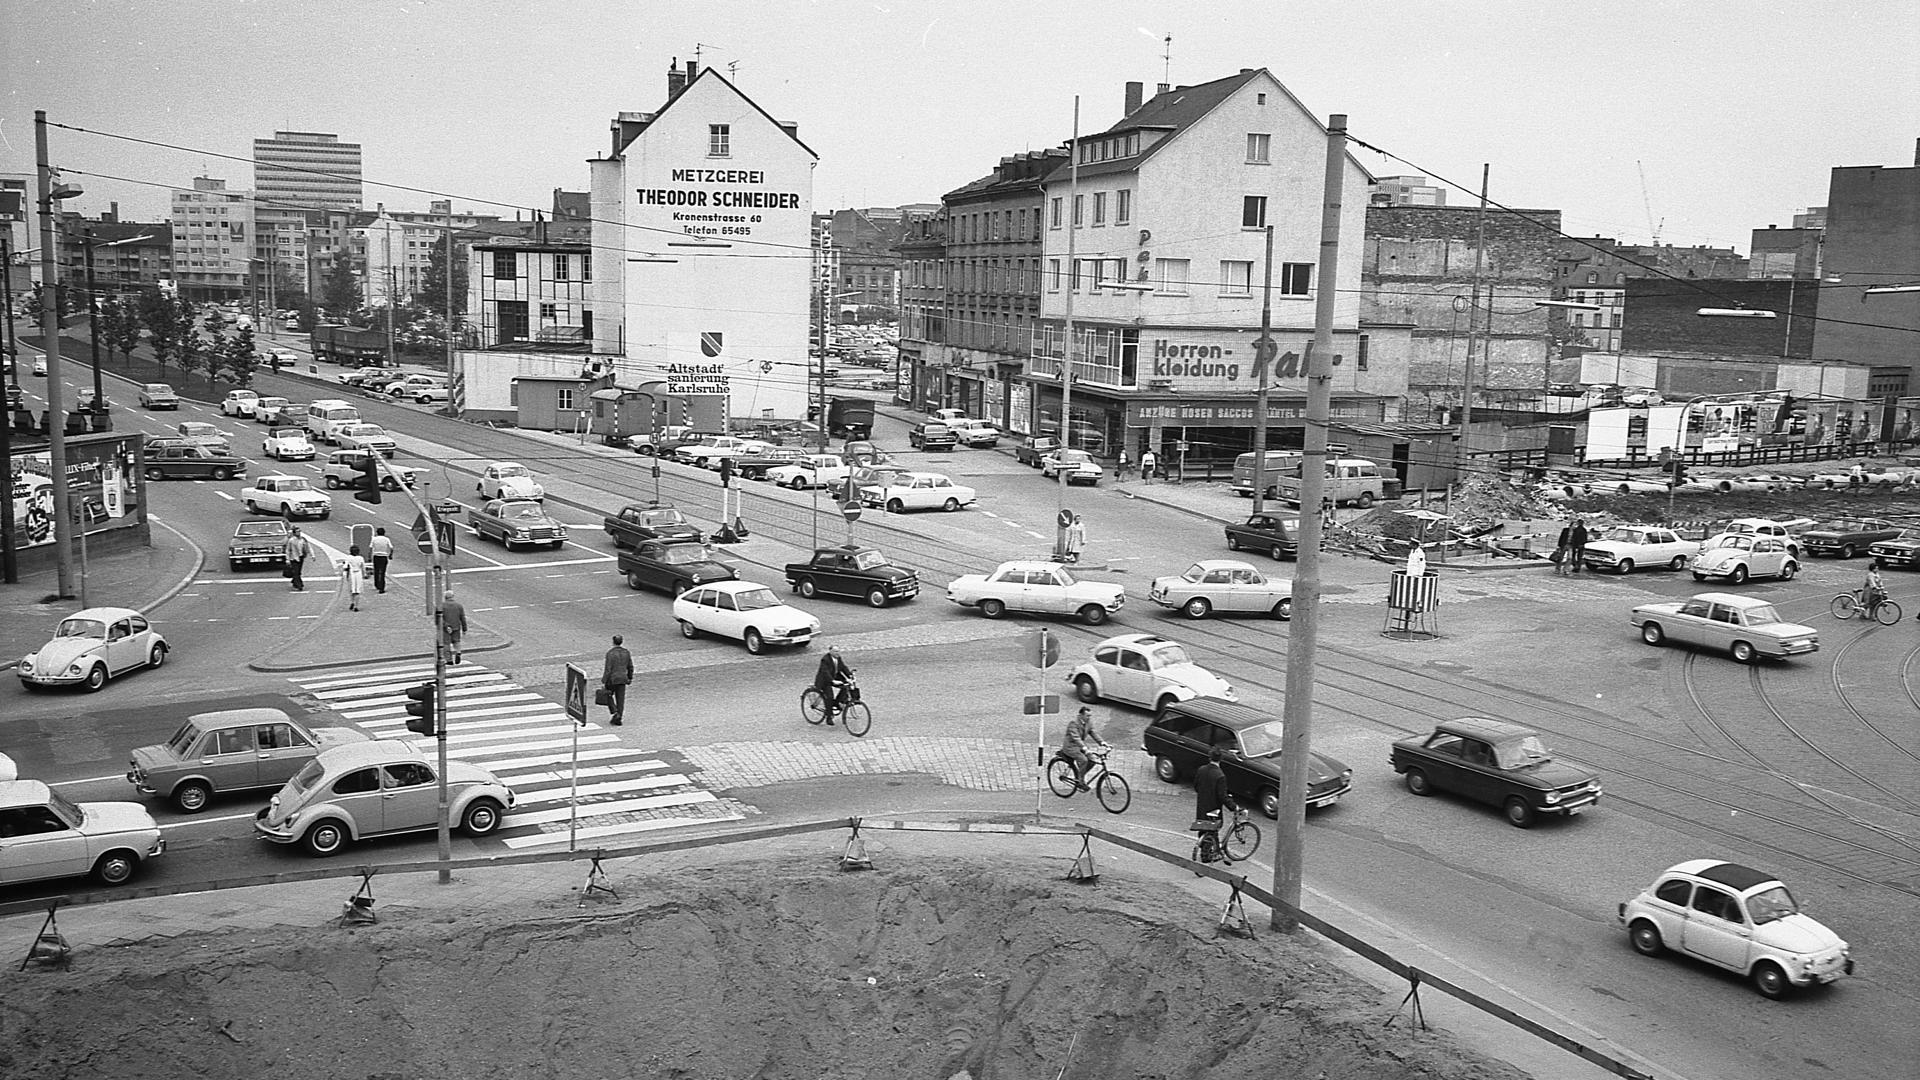 Blick auf den Mendelssohnplatz im Mai 1972